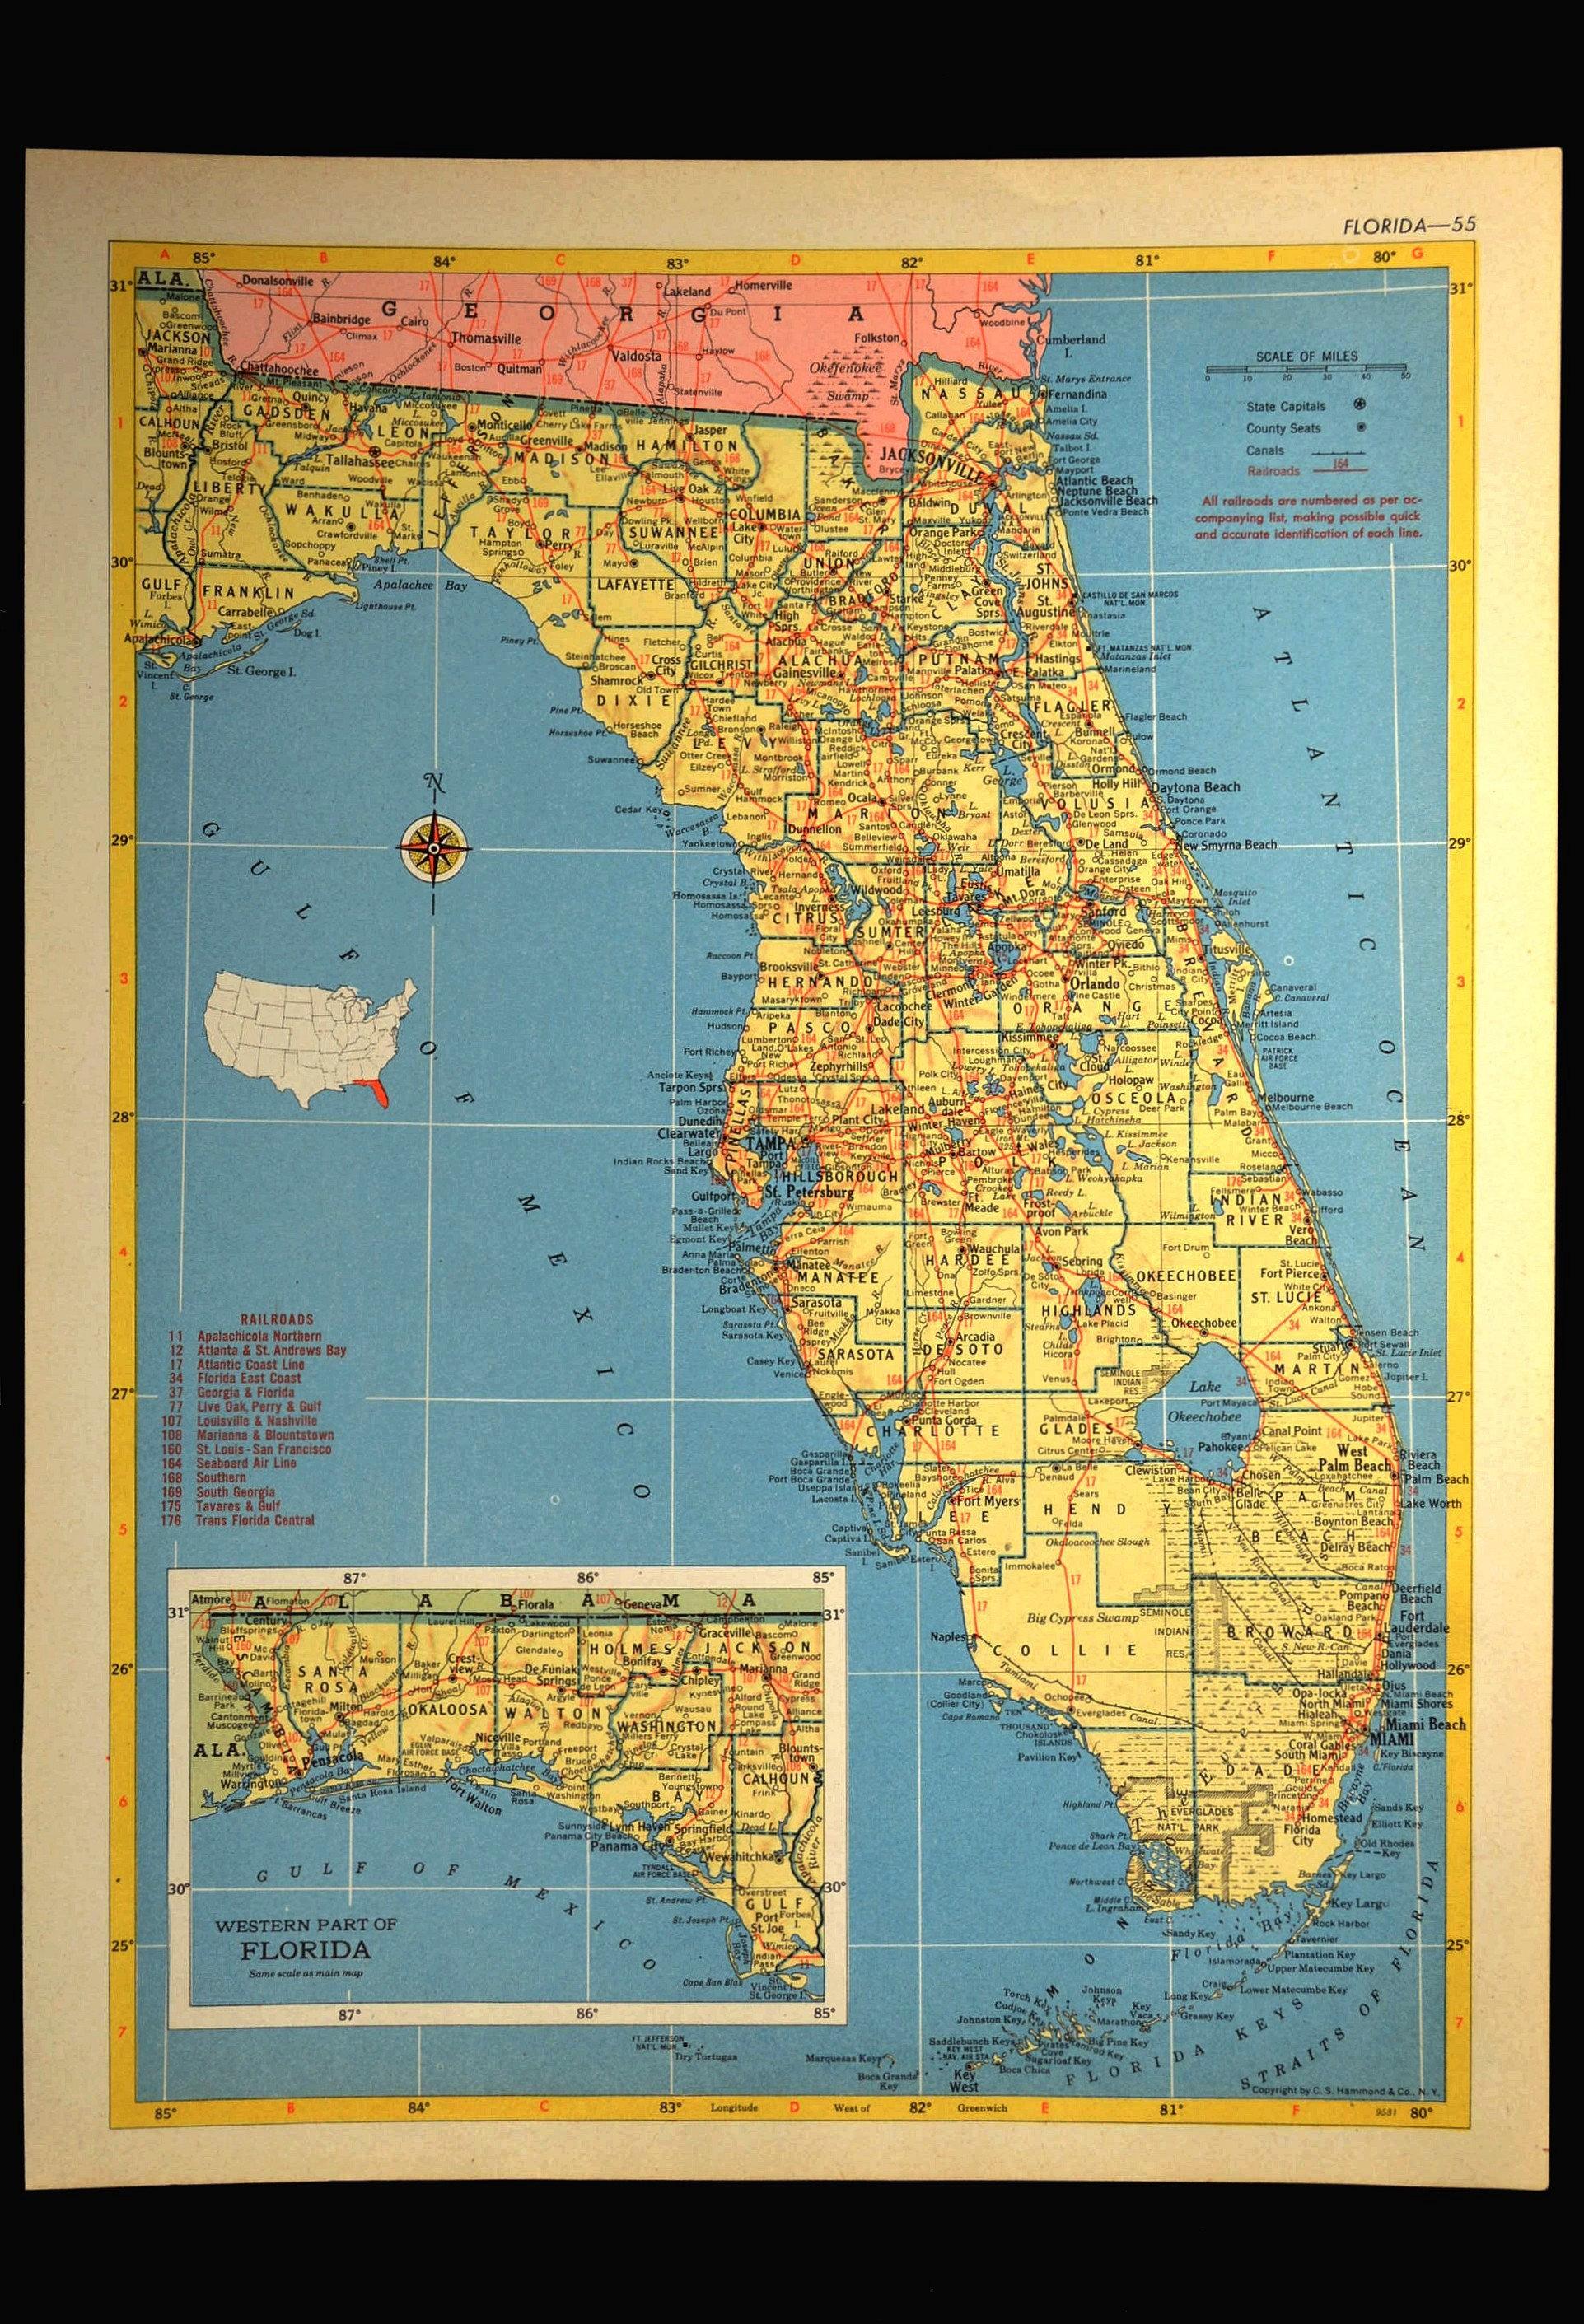 Florida Map Of Florida Wall Art Decor Vintage 1950S Original | Etsy - Florida Map Wall Decor